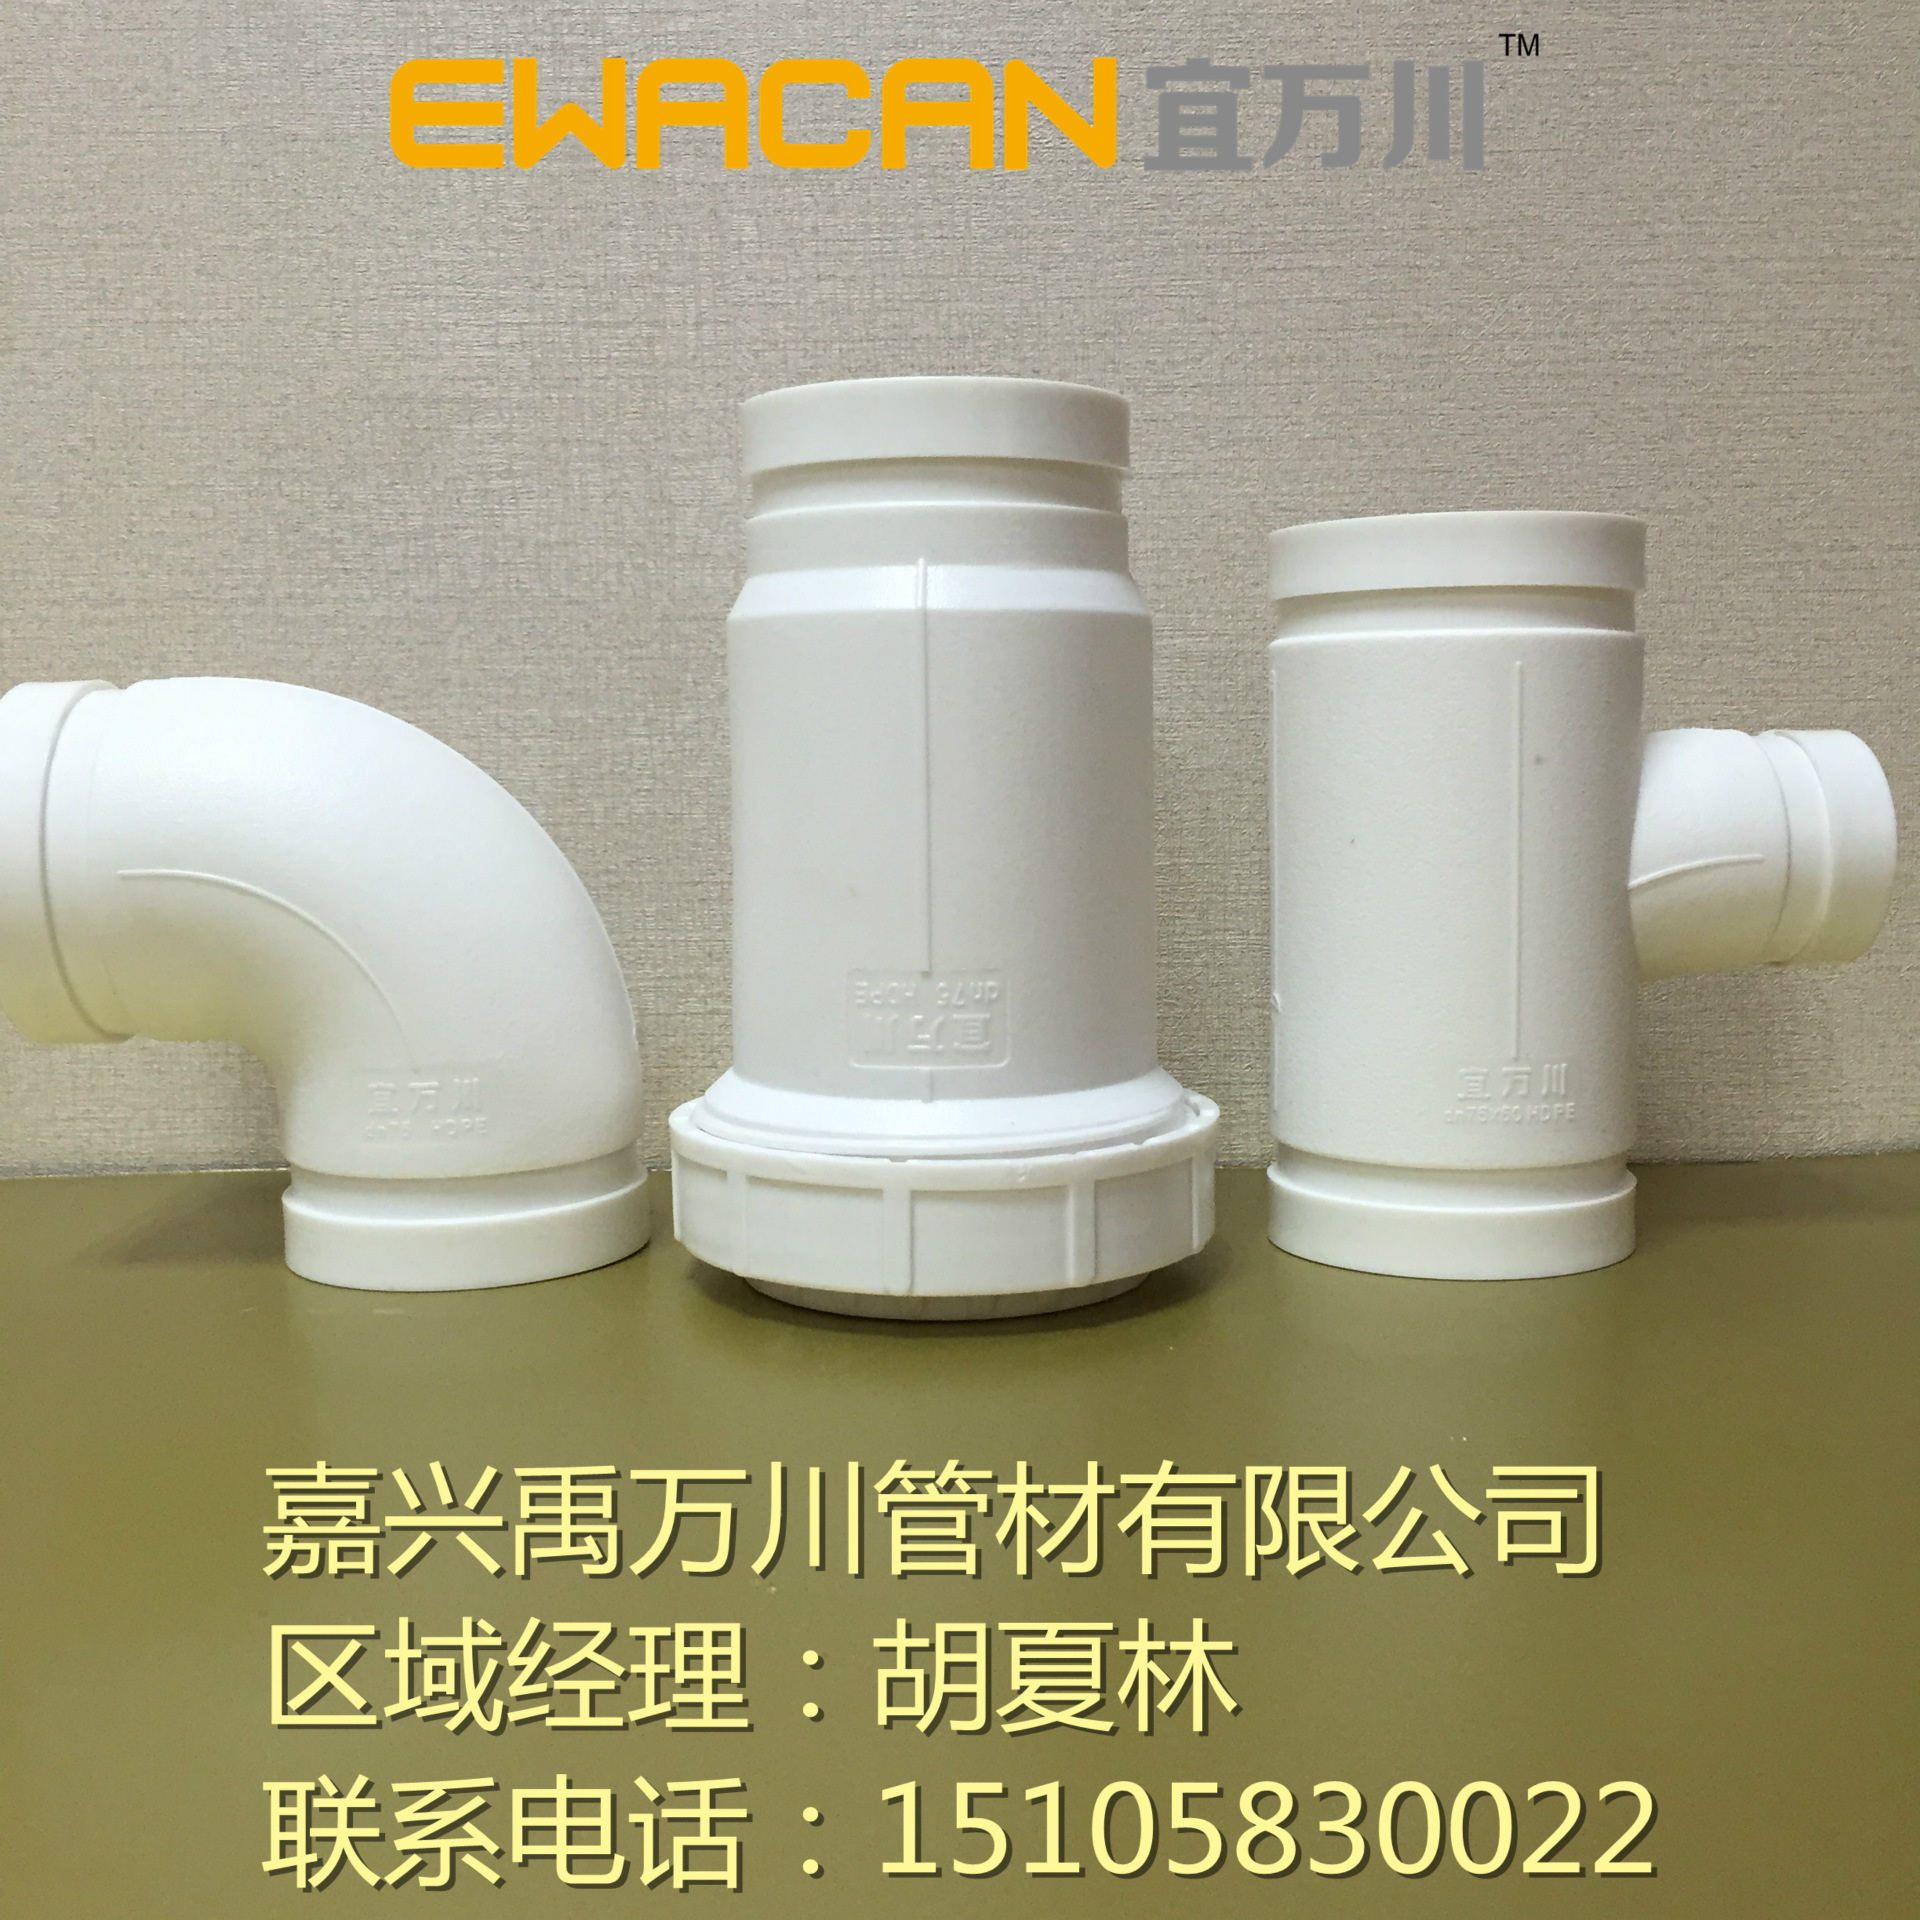 HDPE沟槽式静音排水管,沟槽式中空排水管,PE沟槽管,伸缩节示例图2